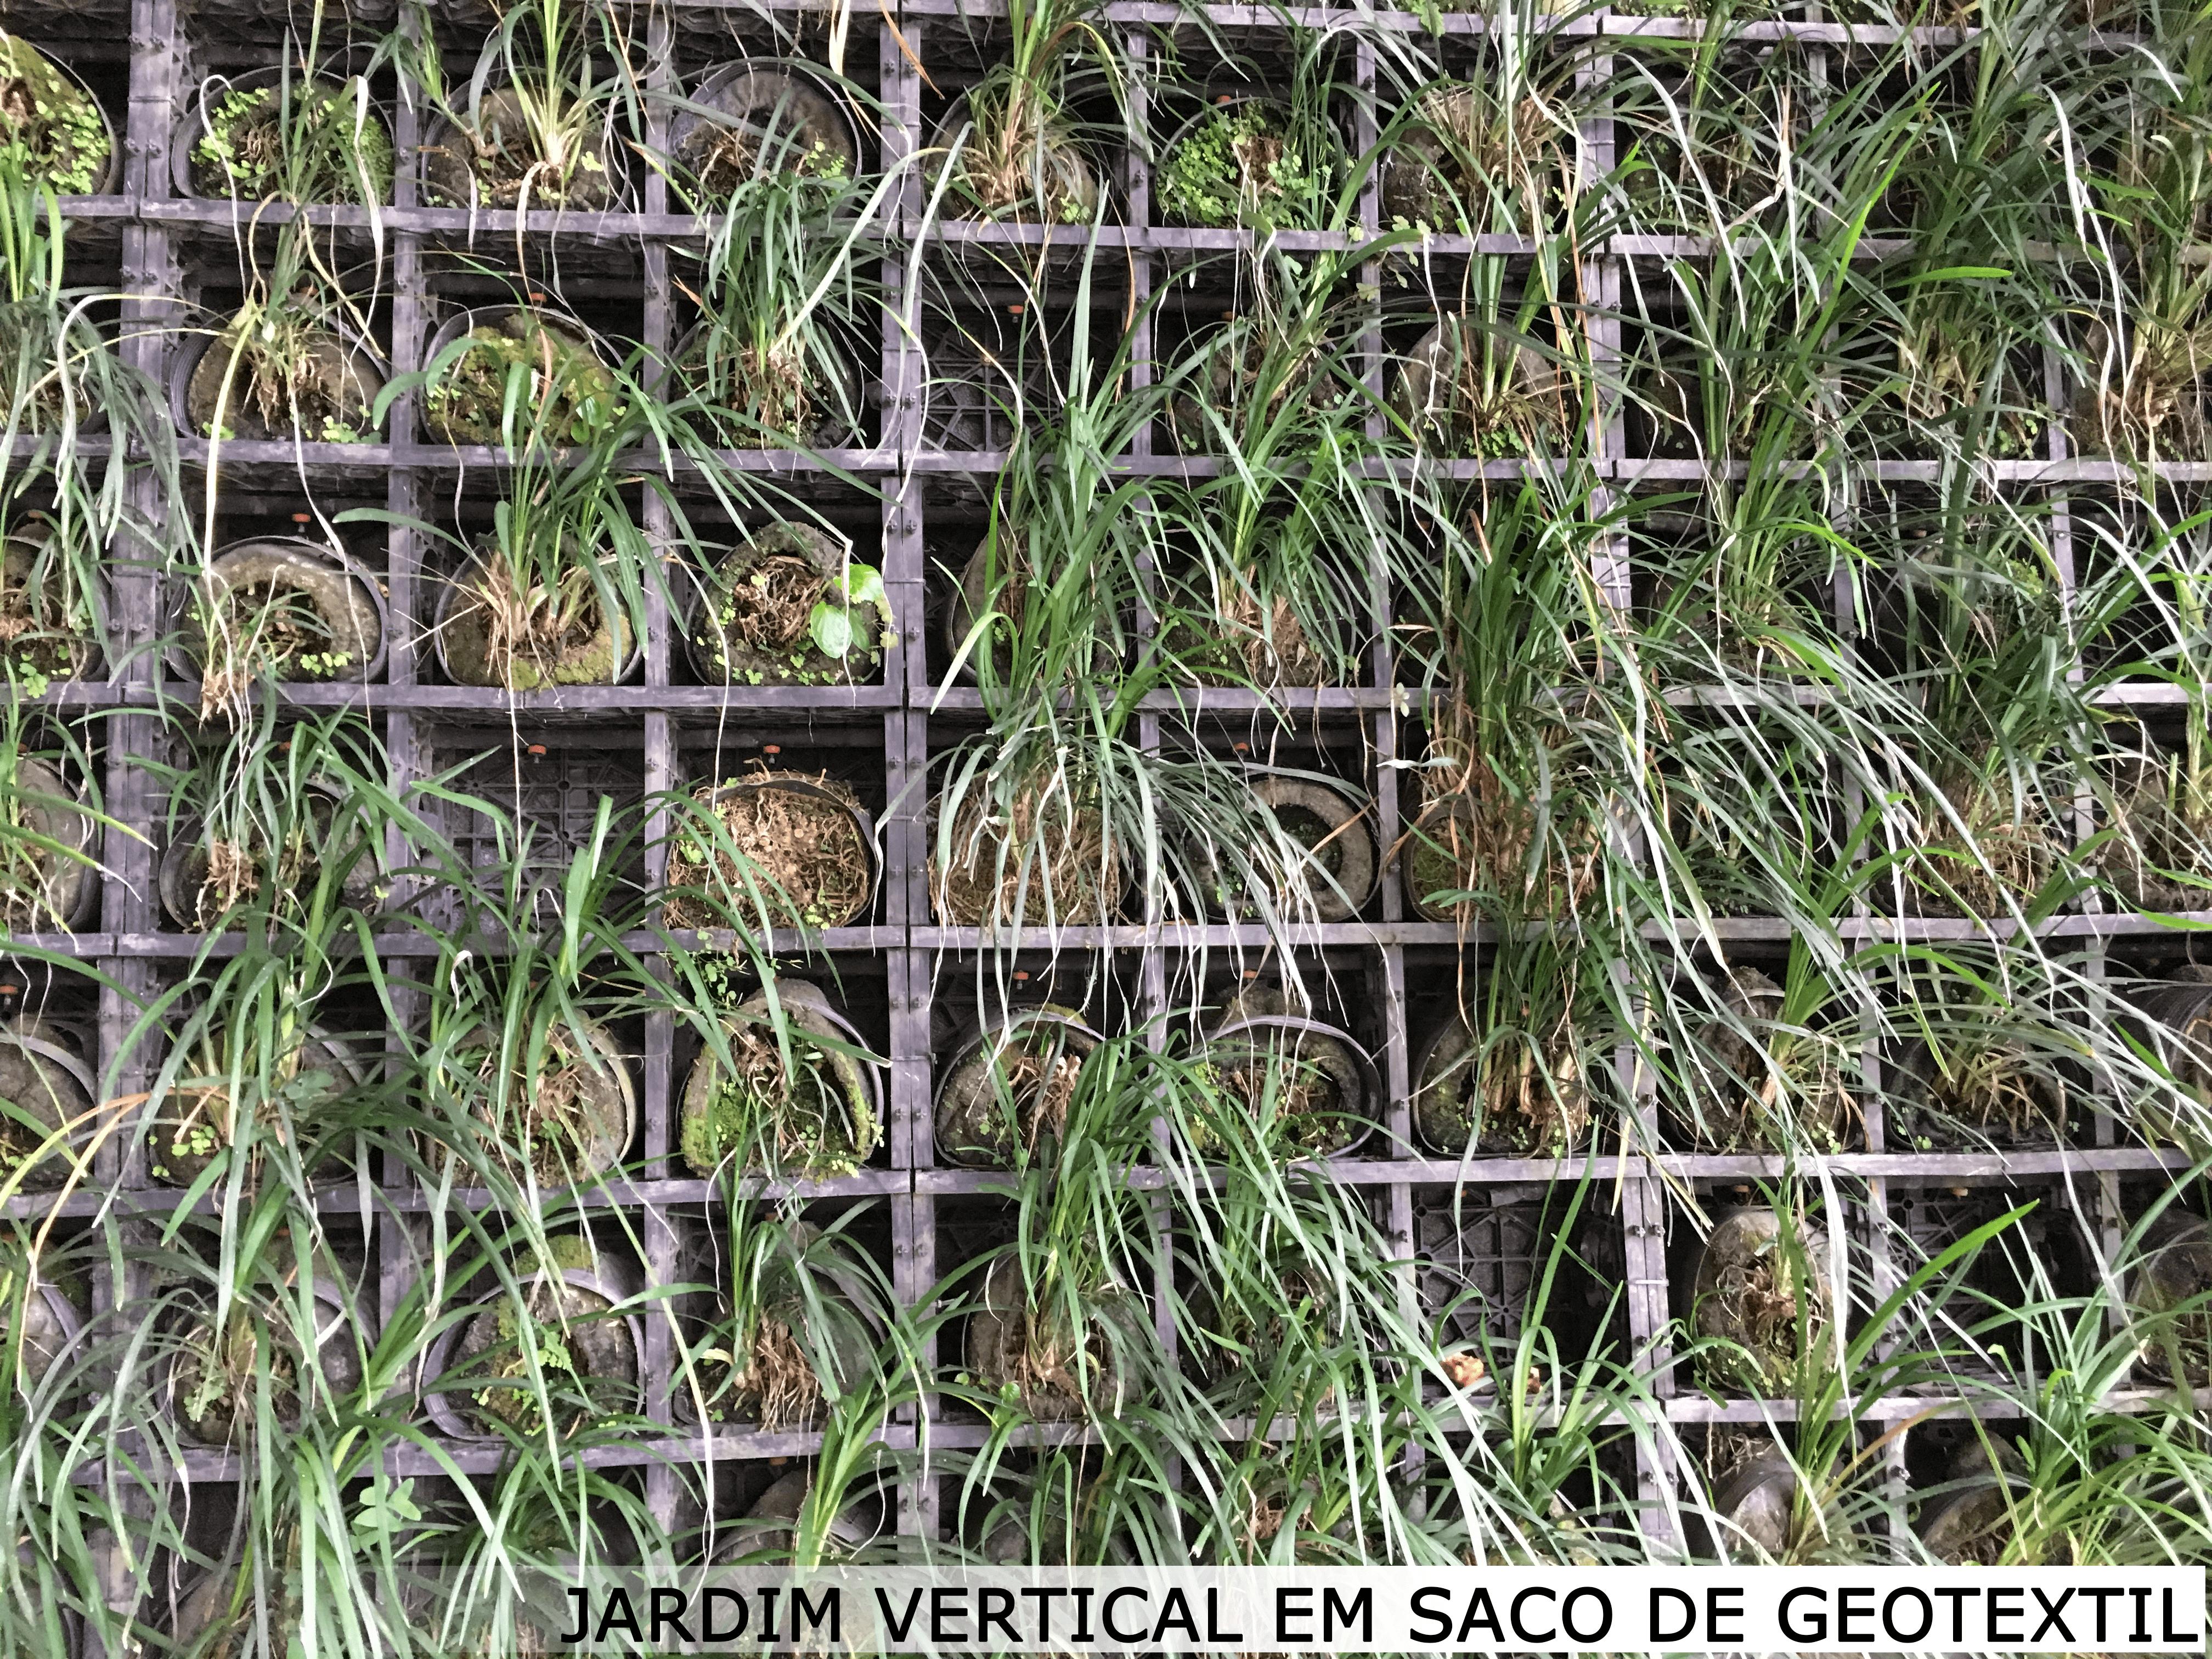 jardim vertical em saco geotextil